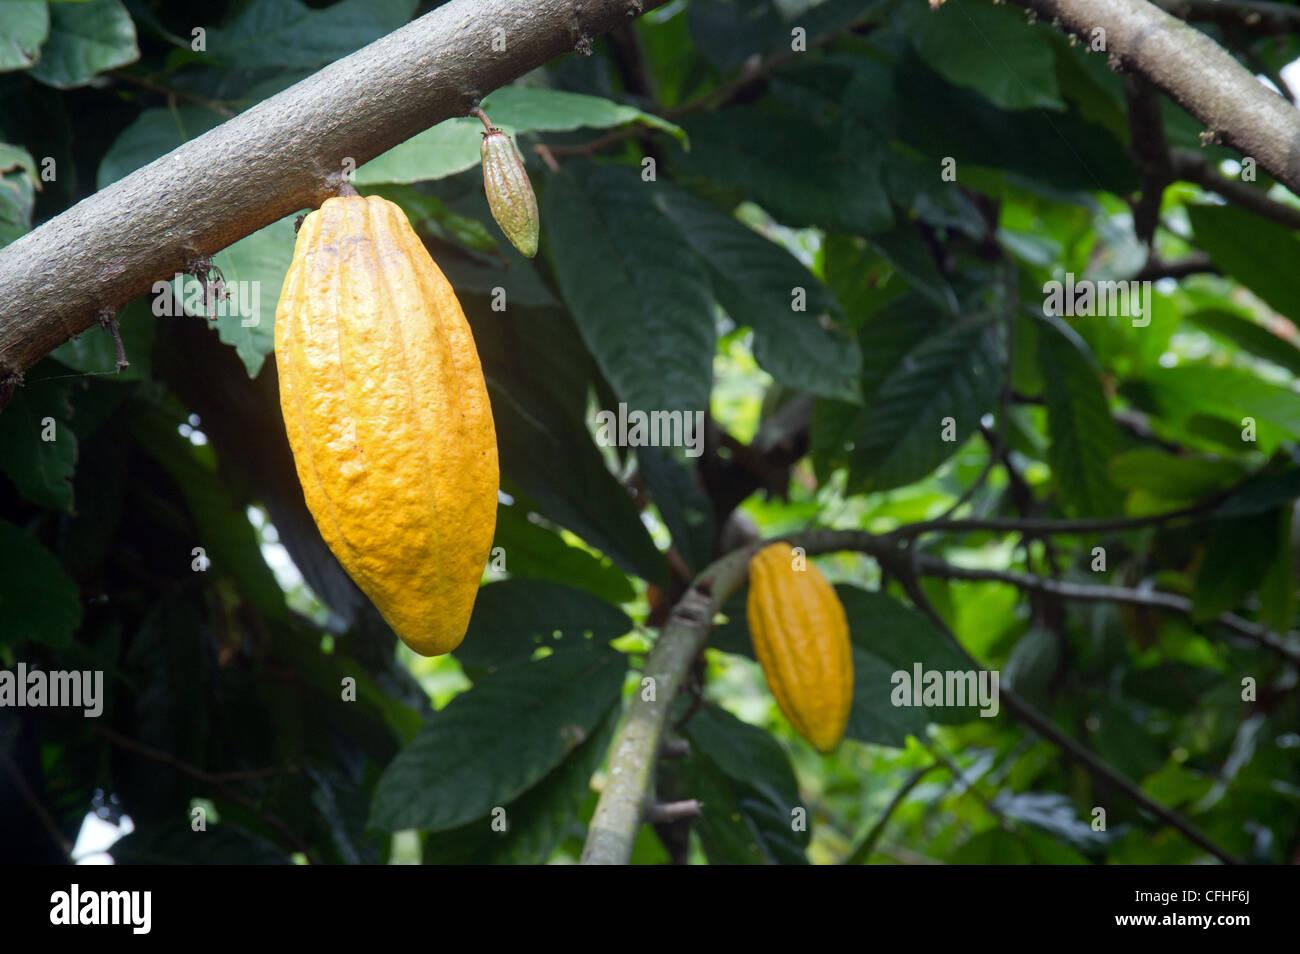 Cocoa pods hang from their tree on a farm in the Rwenzori Mountains near Bundibugyo, western Uganda. - Stock Image